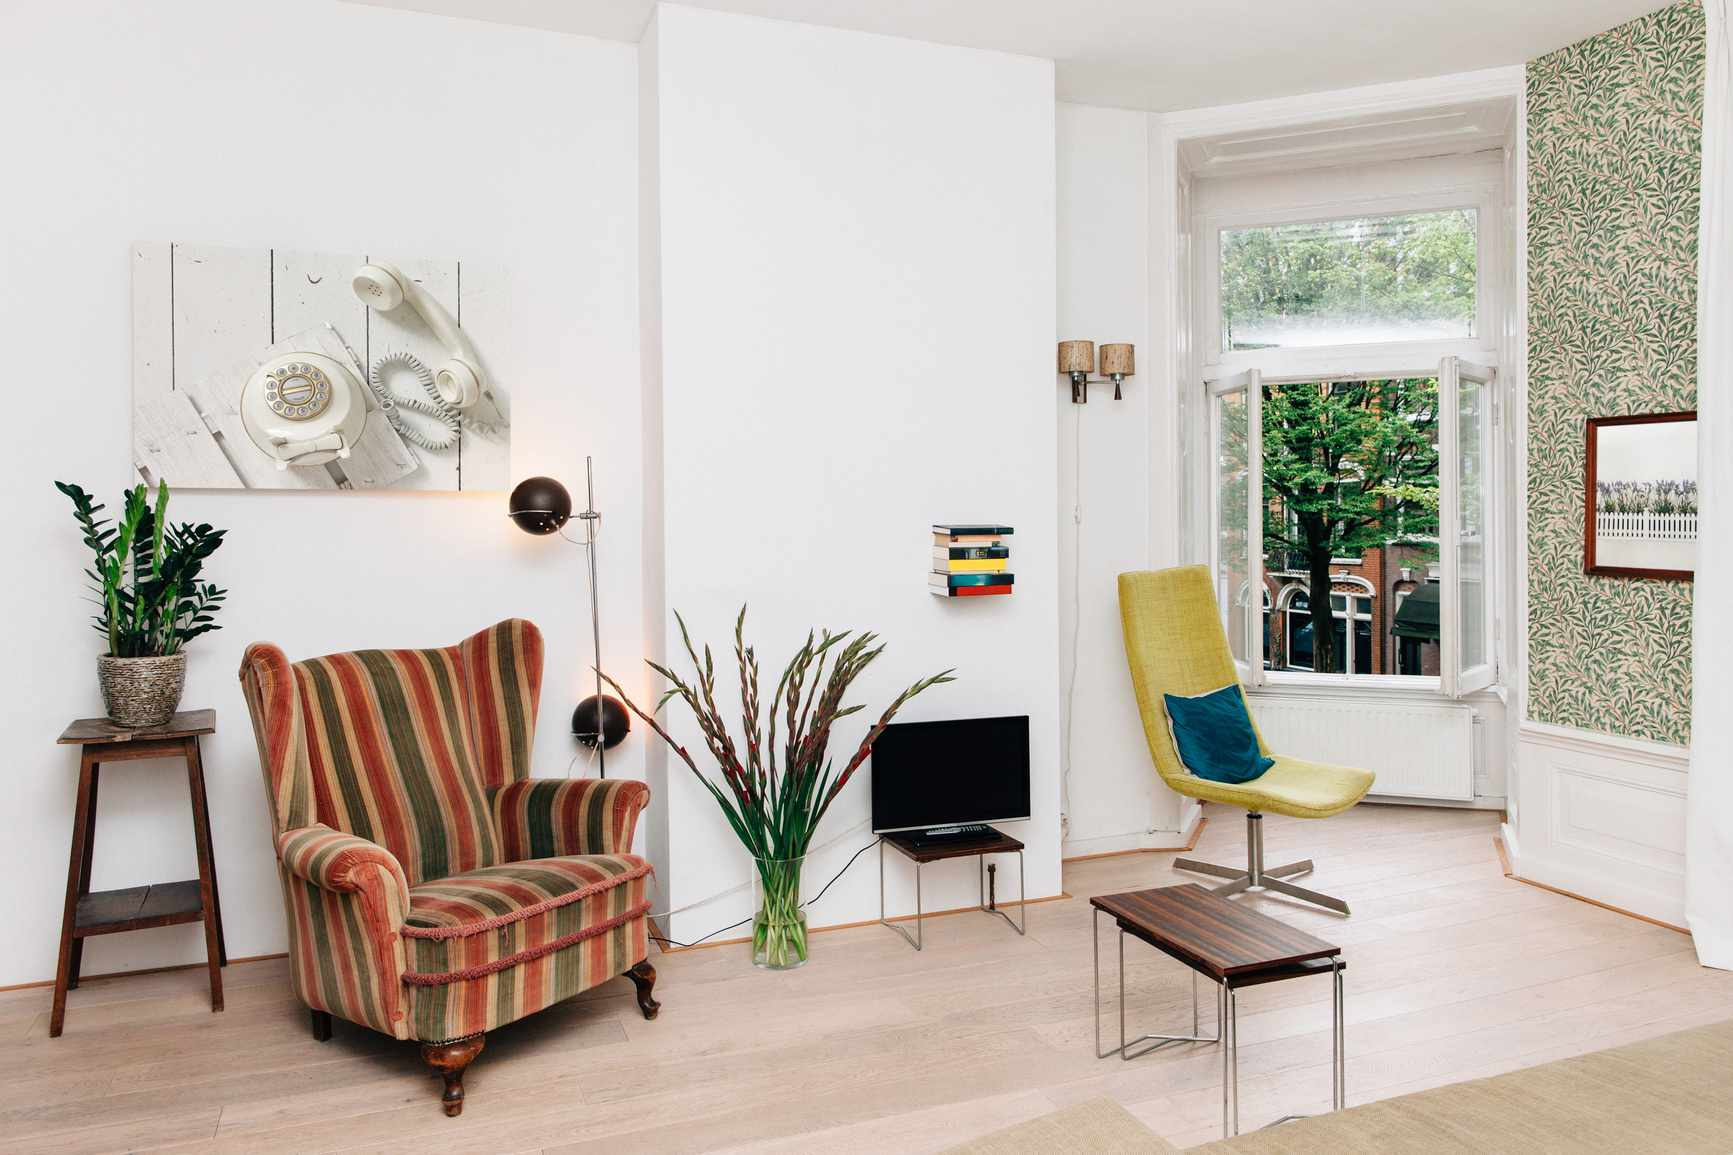 room with vintage furniture